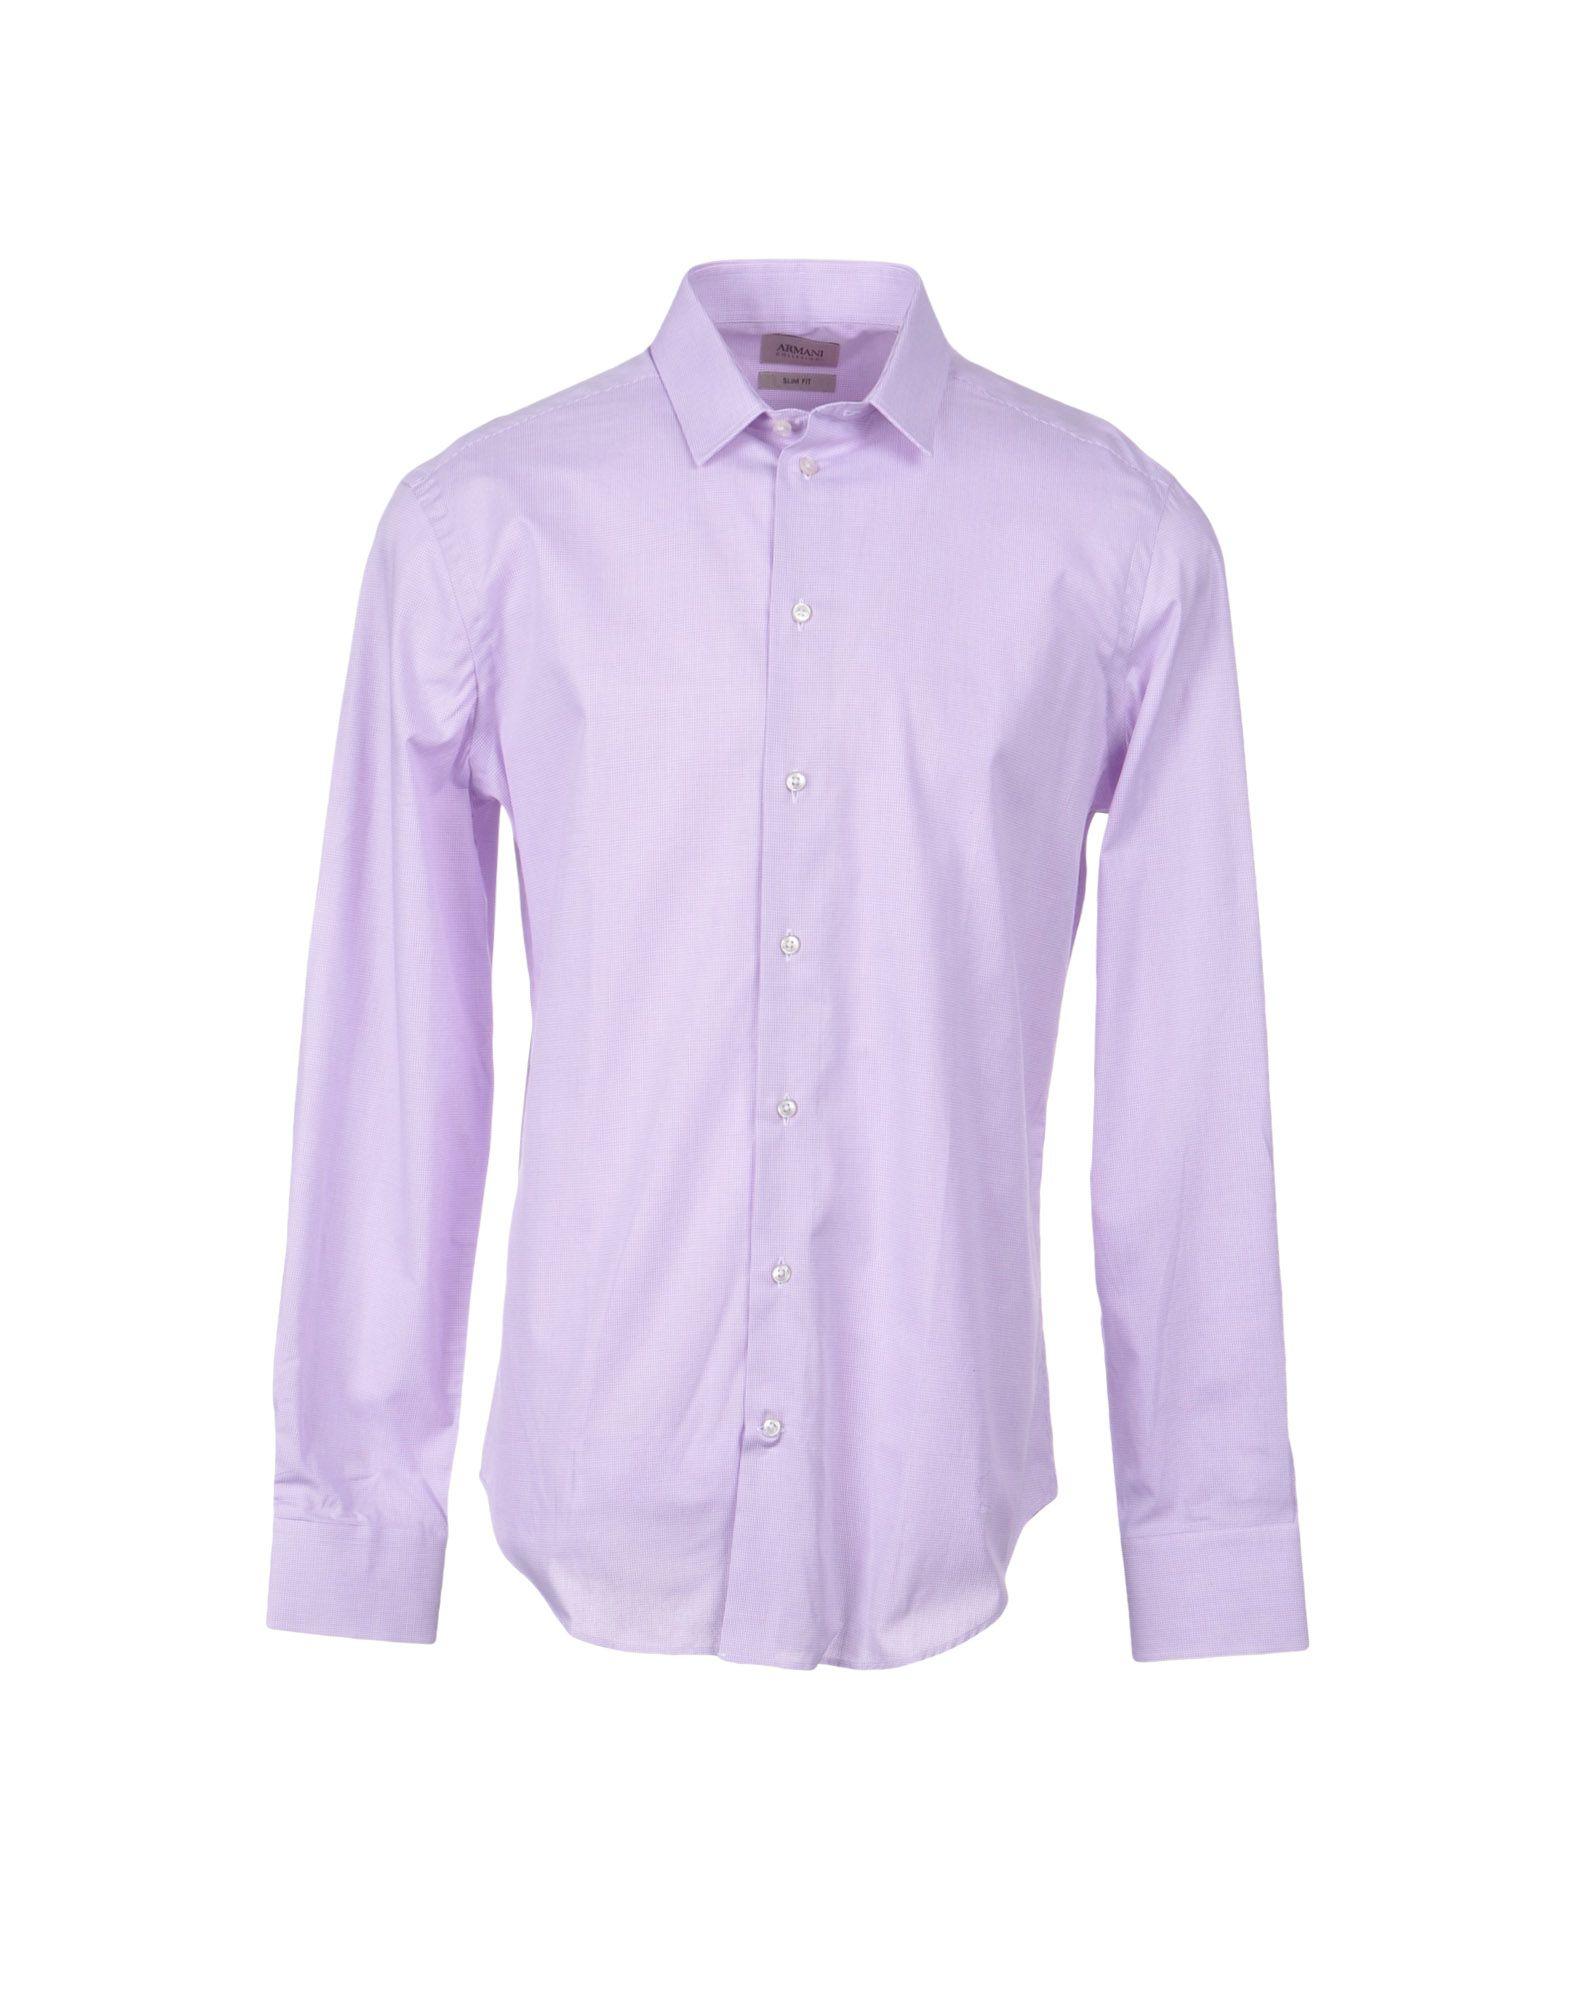 Armani Collezioni Men Sale Yoox United States Andrew Smith Floral Printed Shirt Navy Xxl